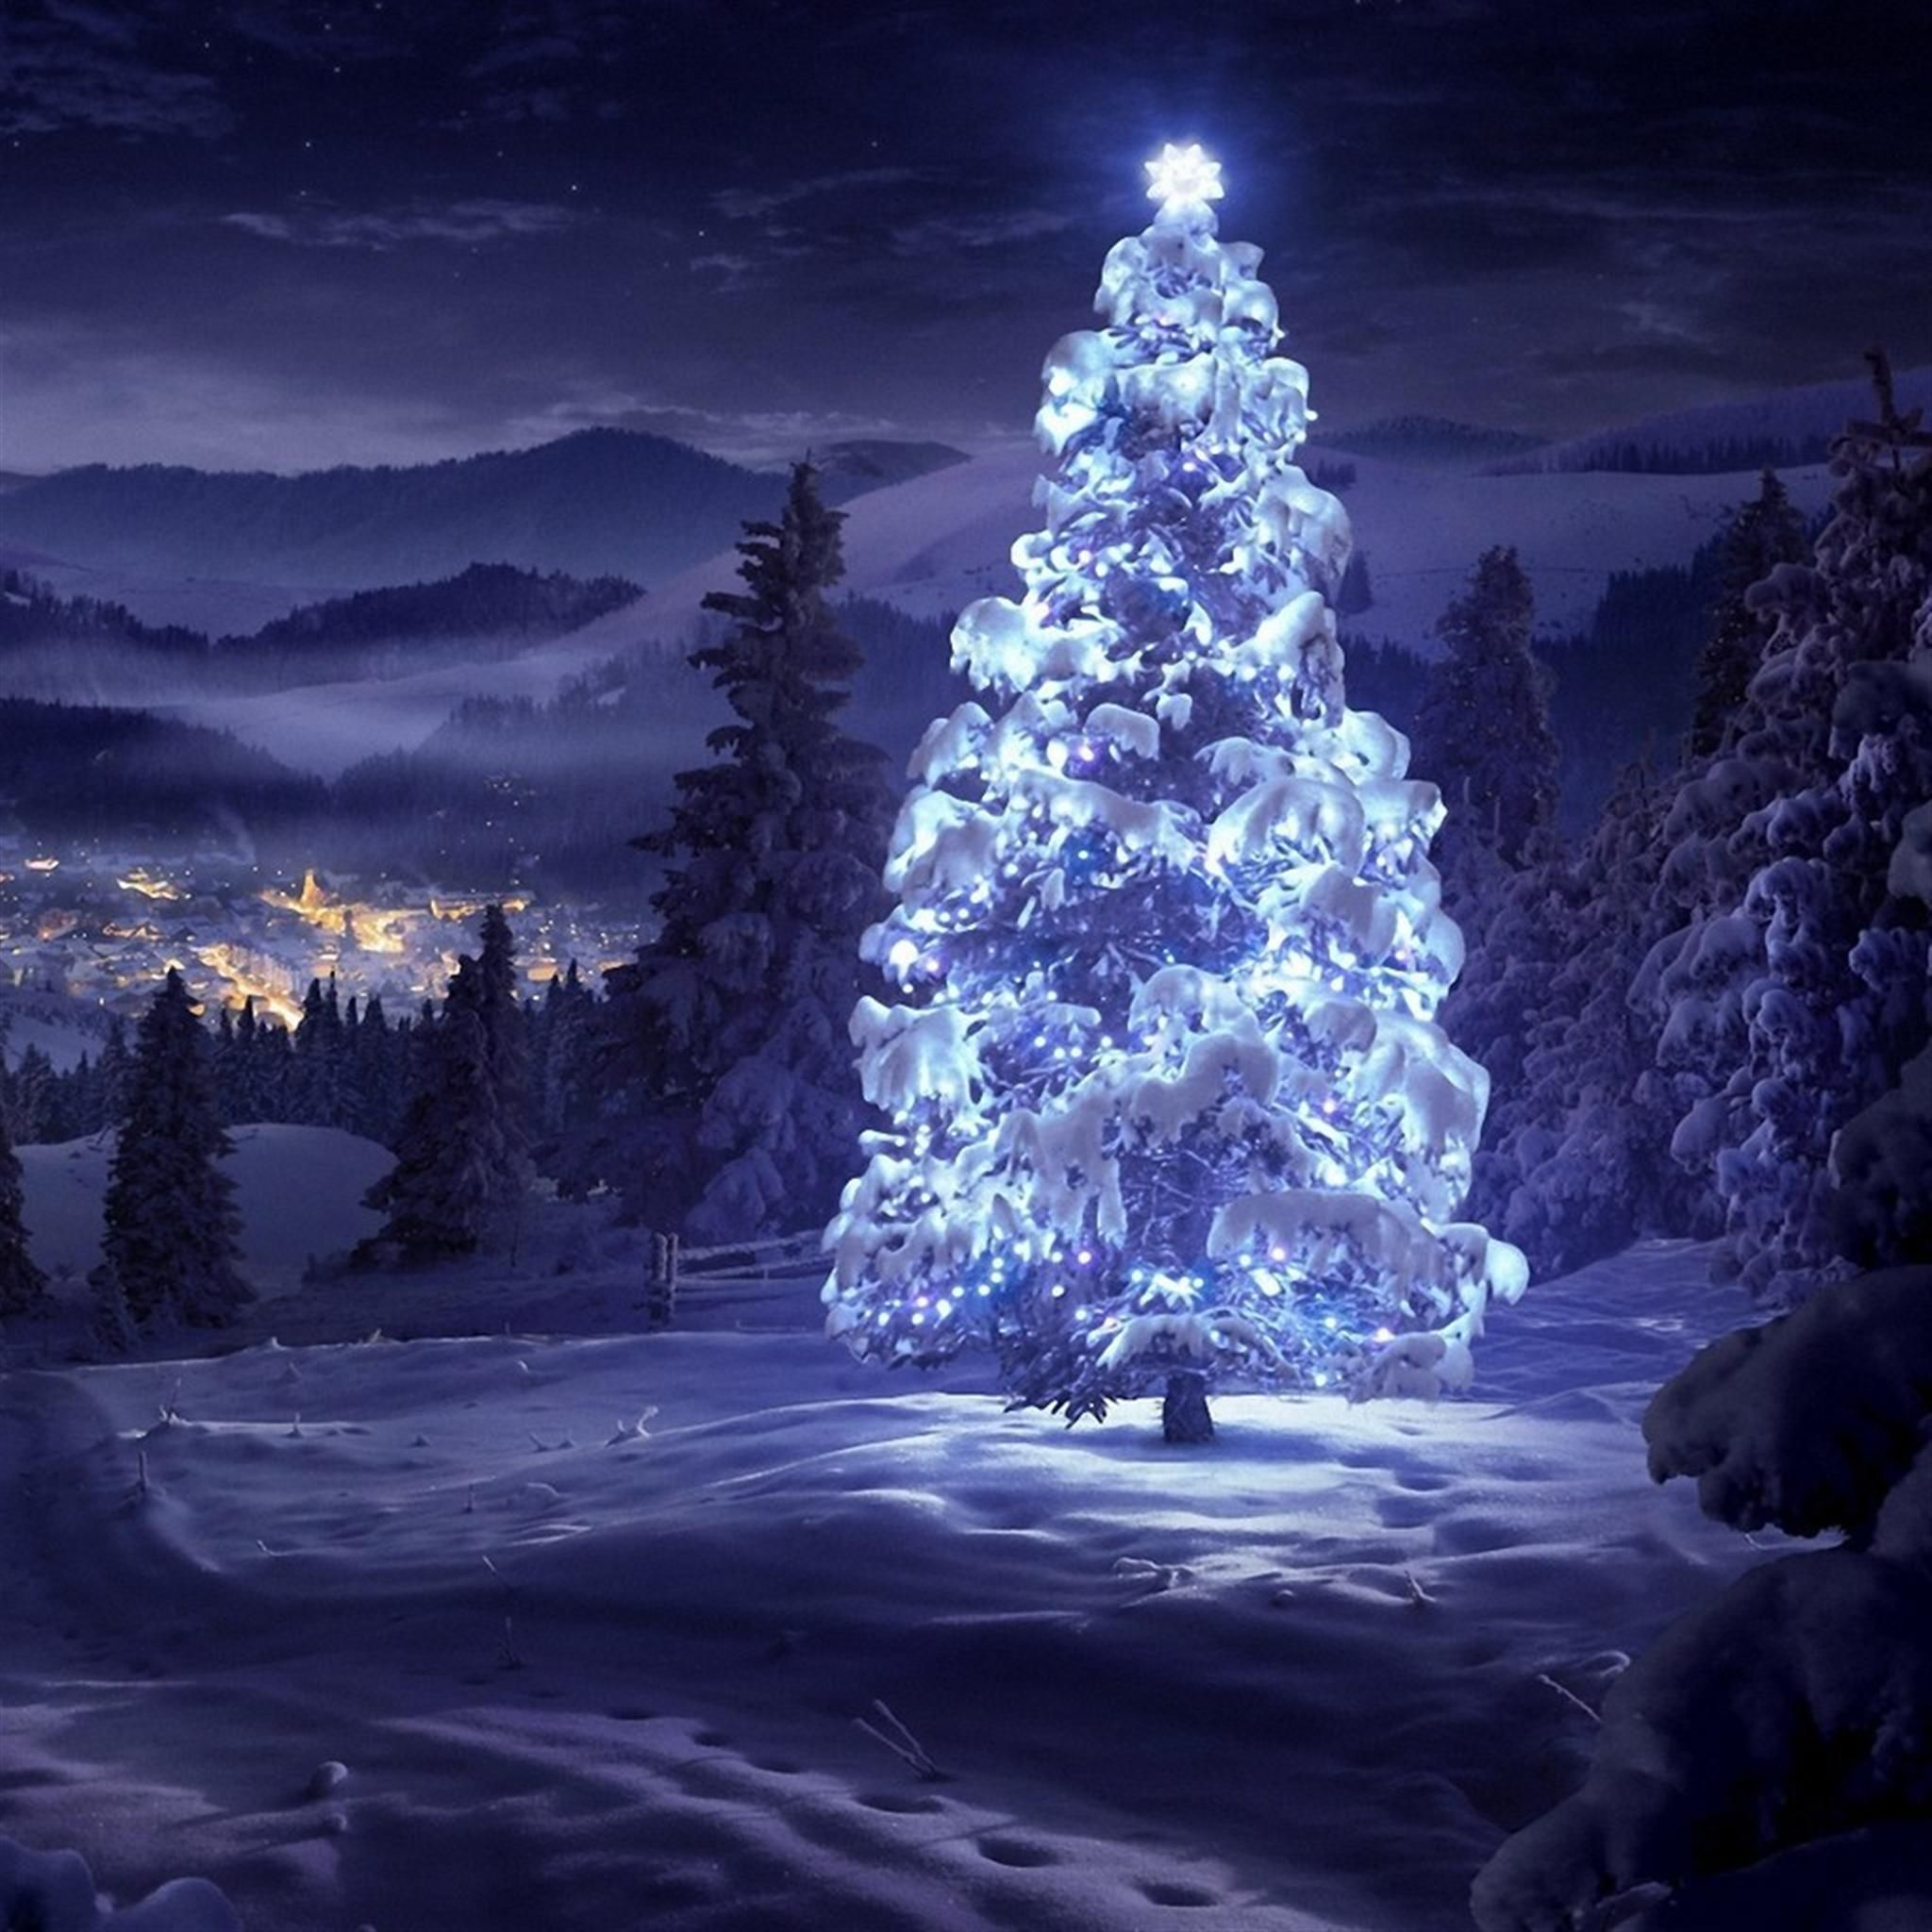 Blue Light Christmas Tree Ipad Wallpaper Christmas Tree Wallpaper Christmas Wallpaper Beautiful Christmas